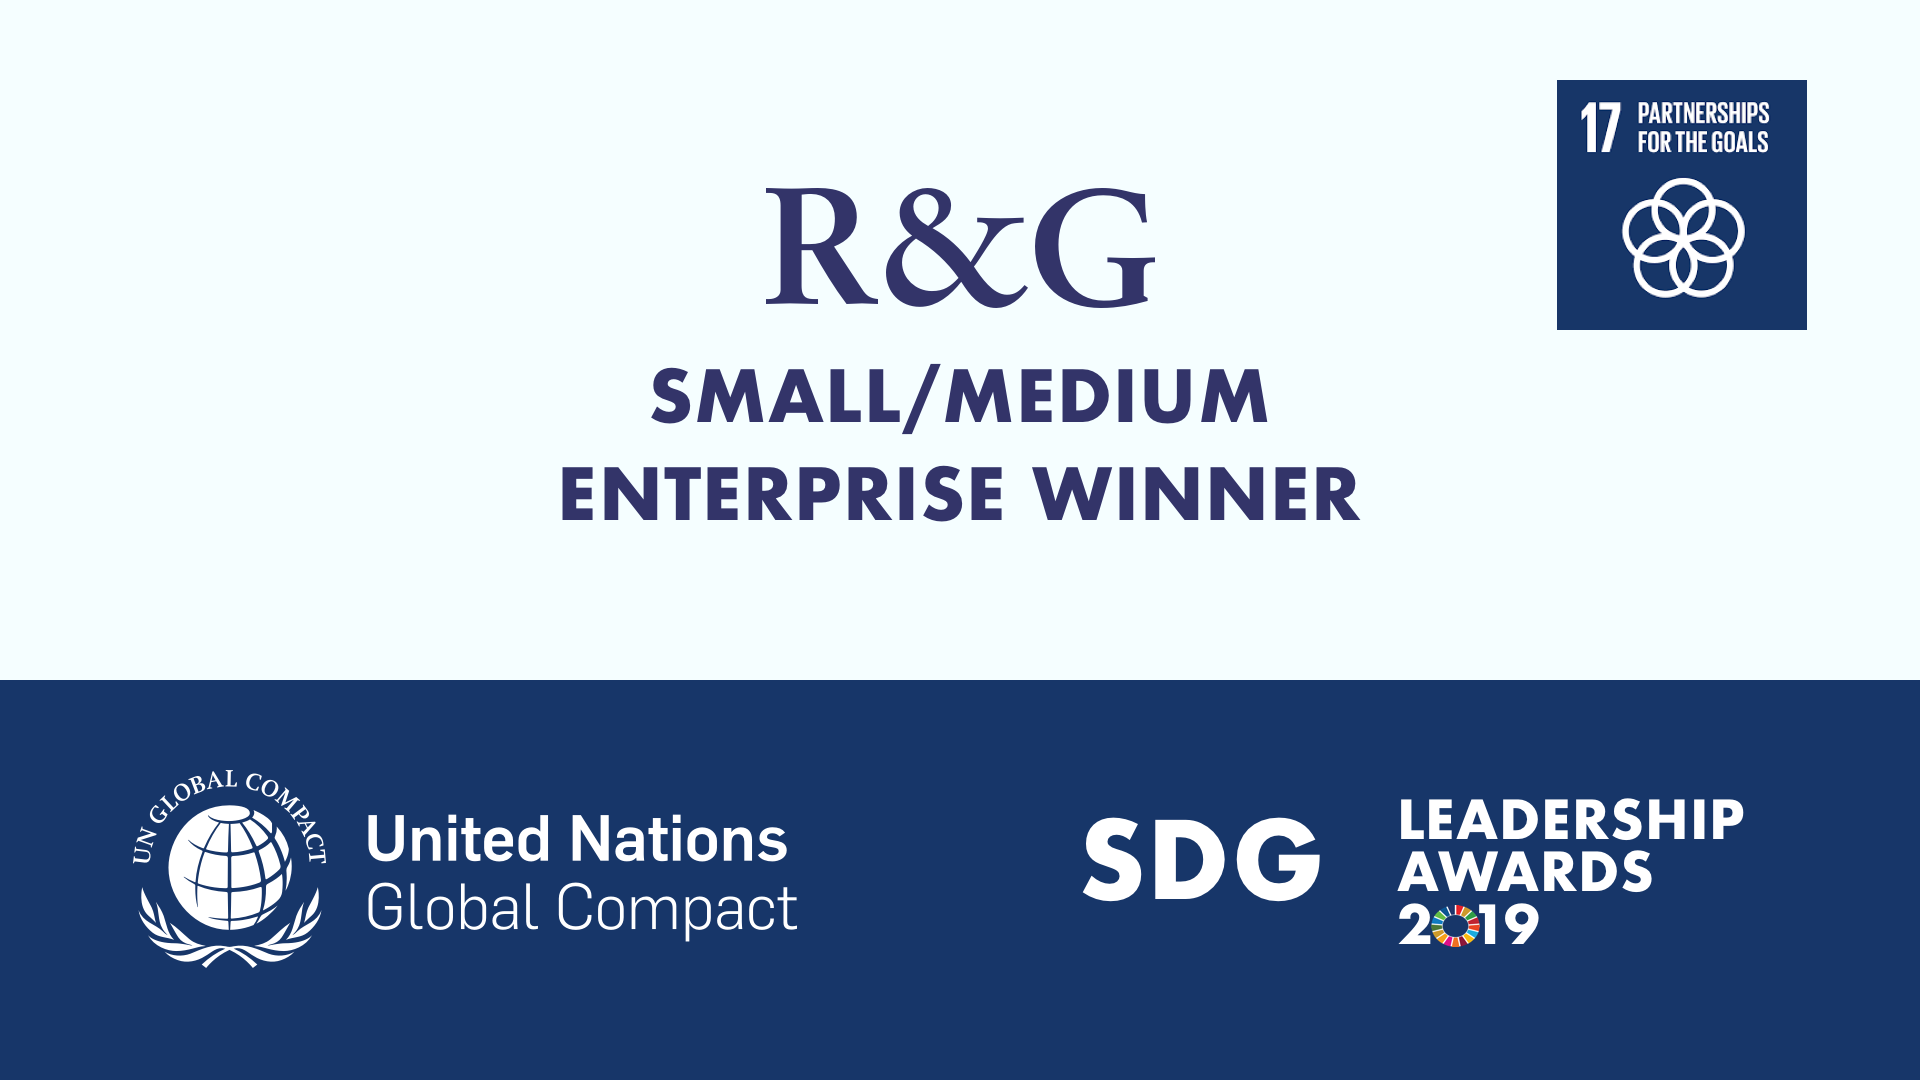 R&G Small/Medium Enterprise Winner